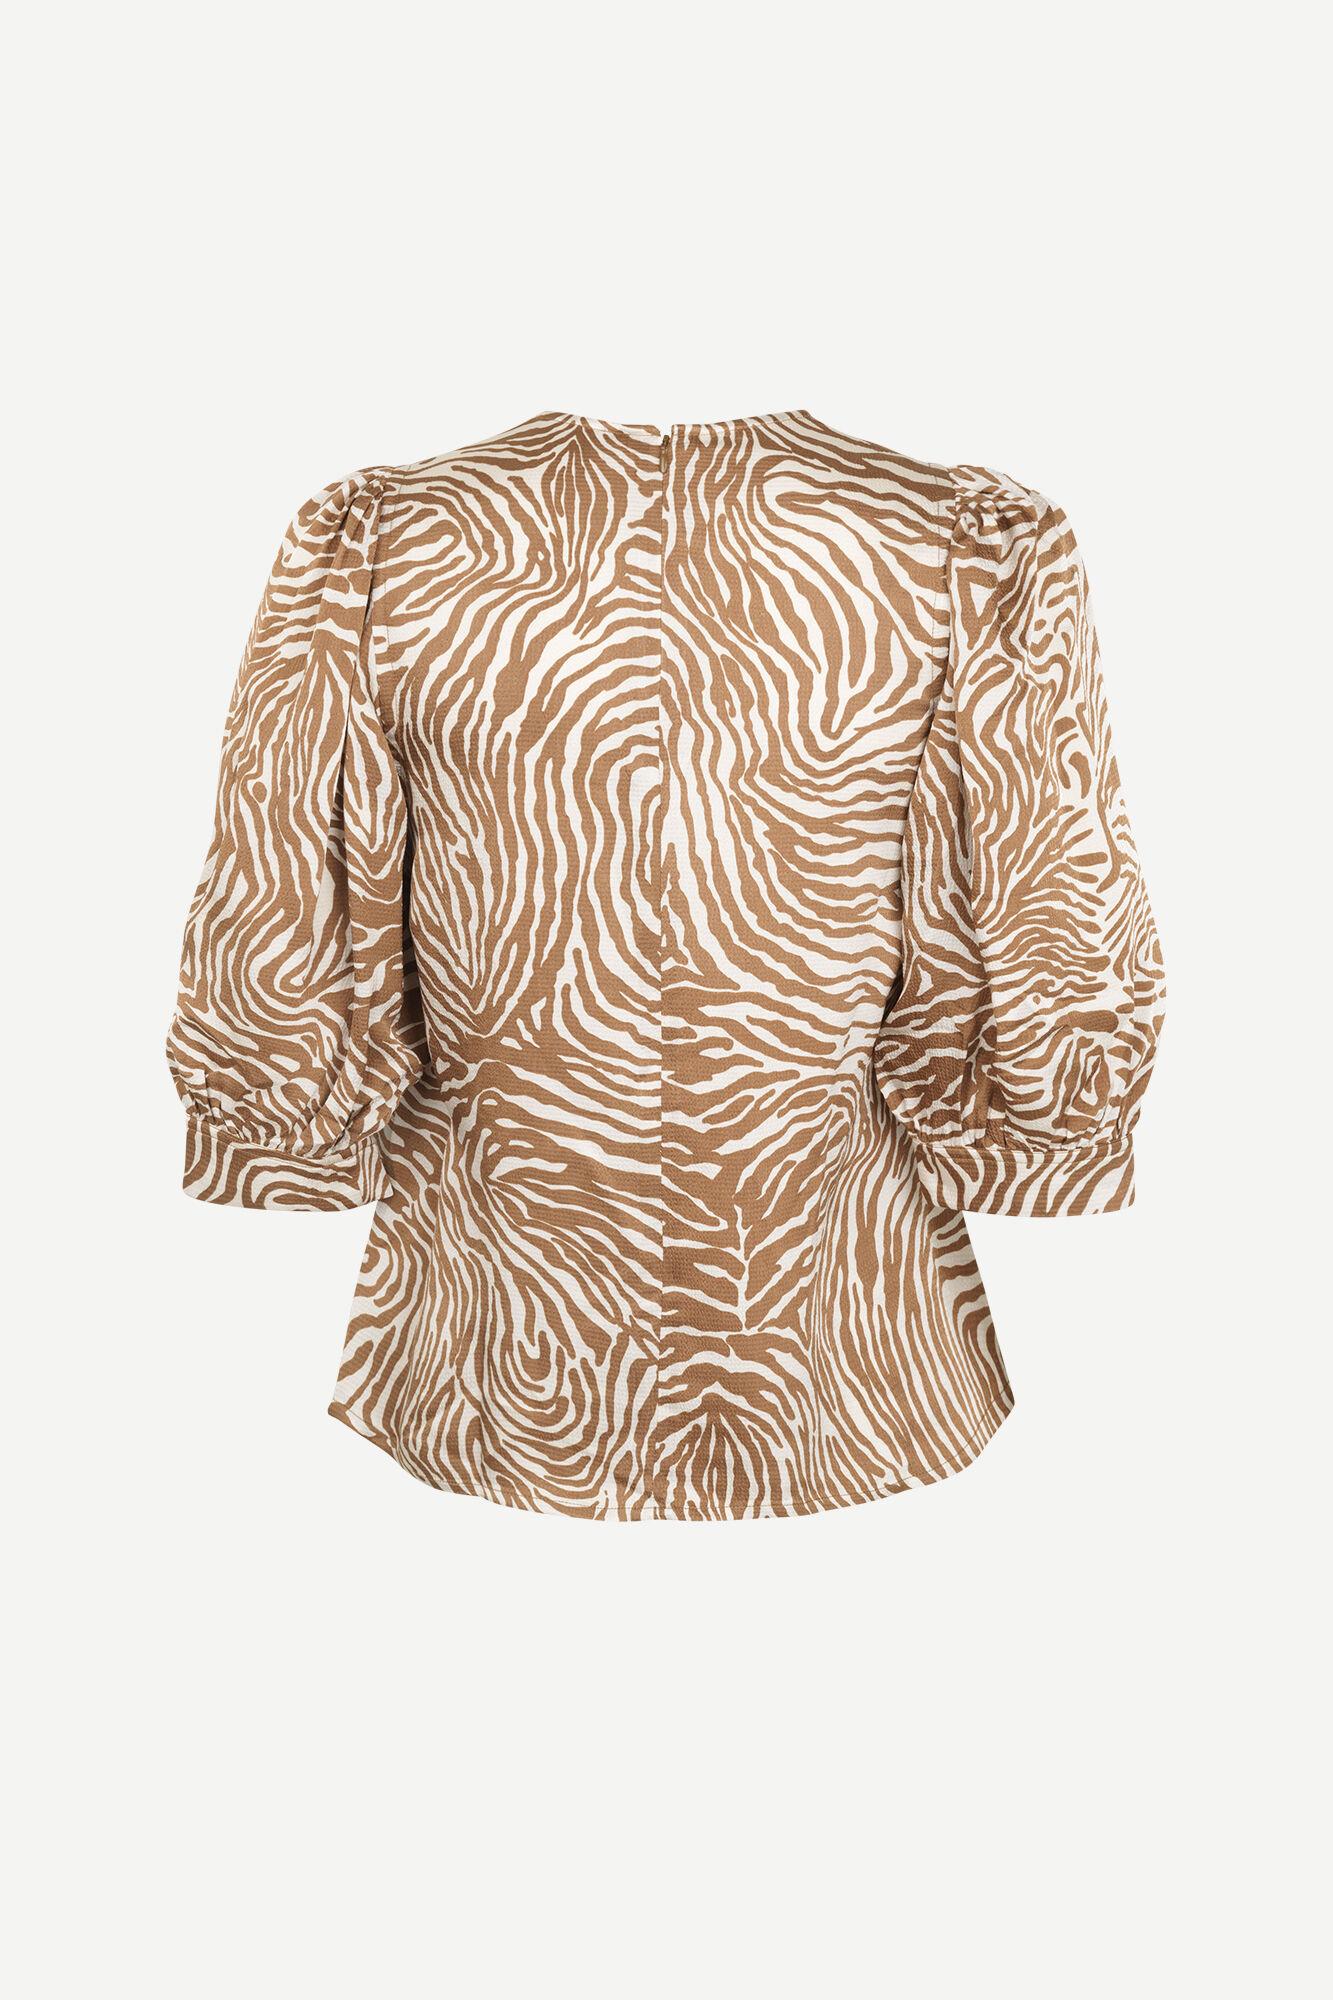 Celestina blouse aop 12887, MOUNTAIN ZEBRA